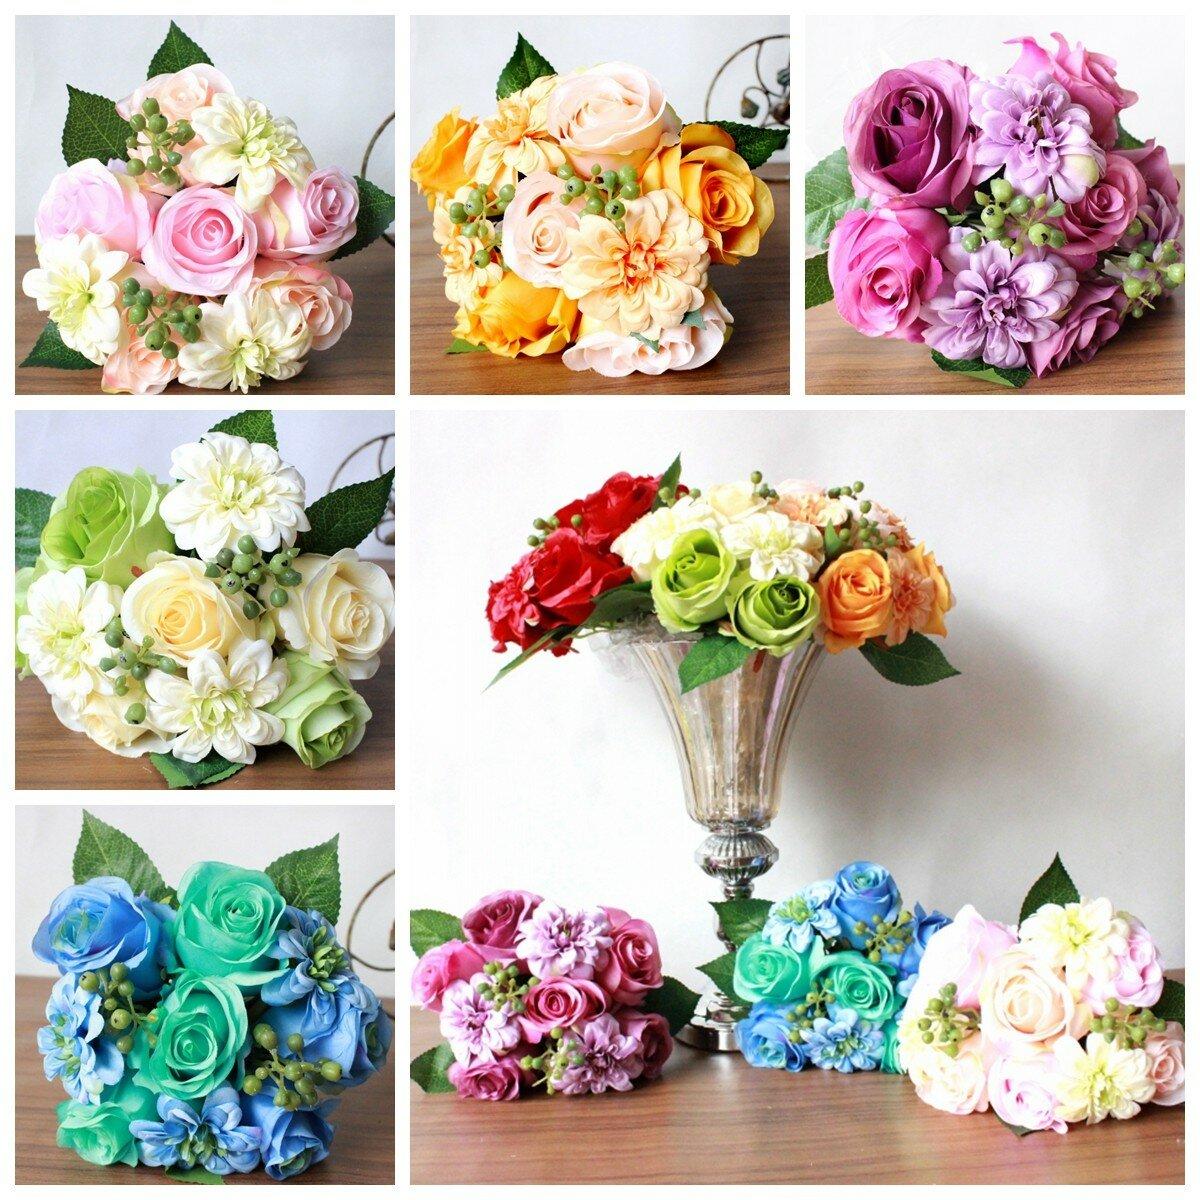 Bride Silk Rose Dahlia Bouquet Artificial Flower Wedding Party Supply Home Decoration